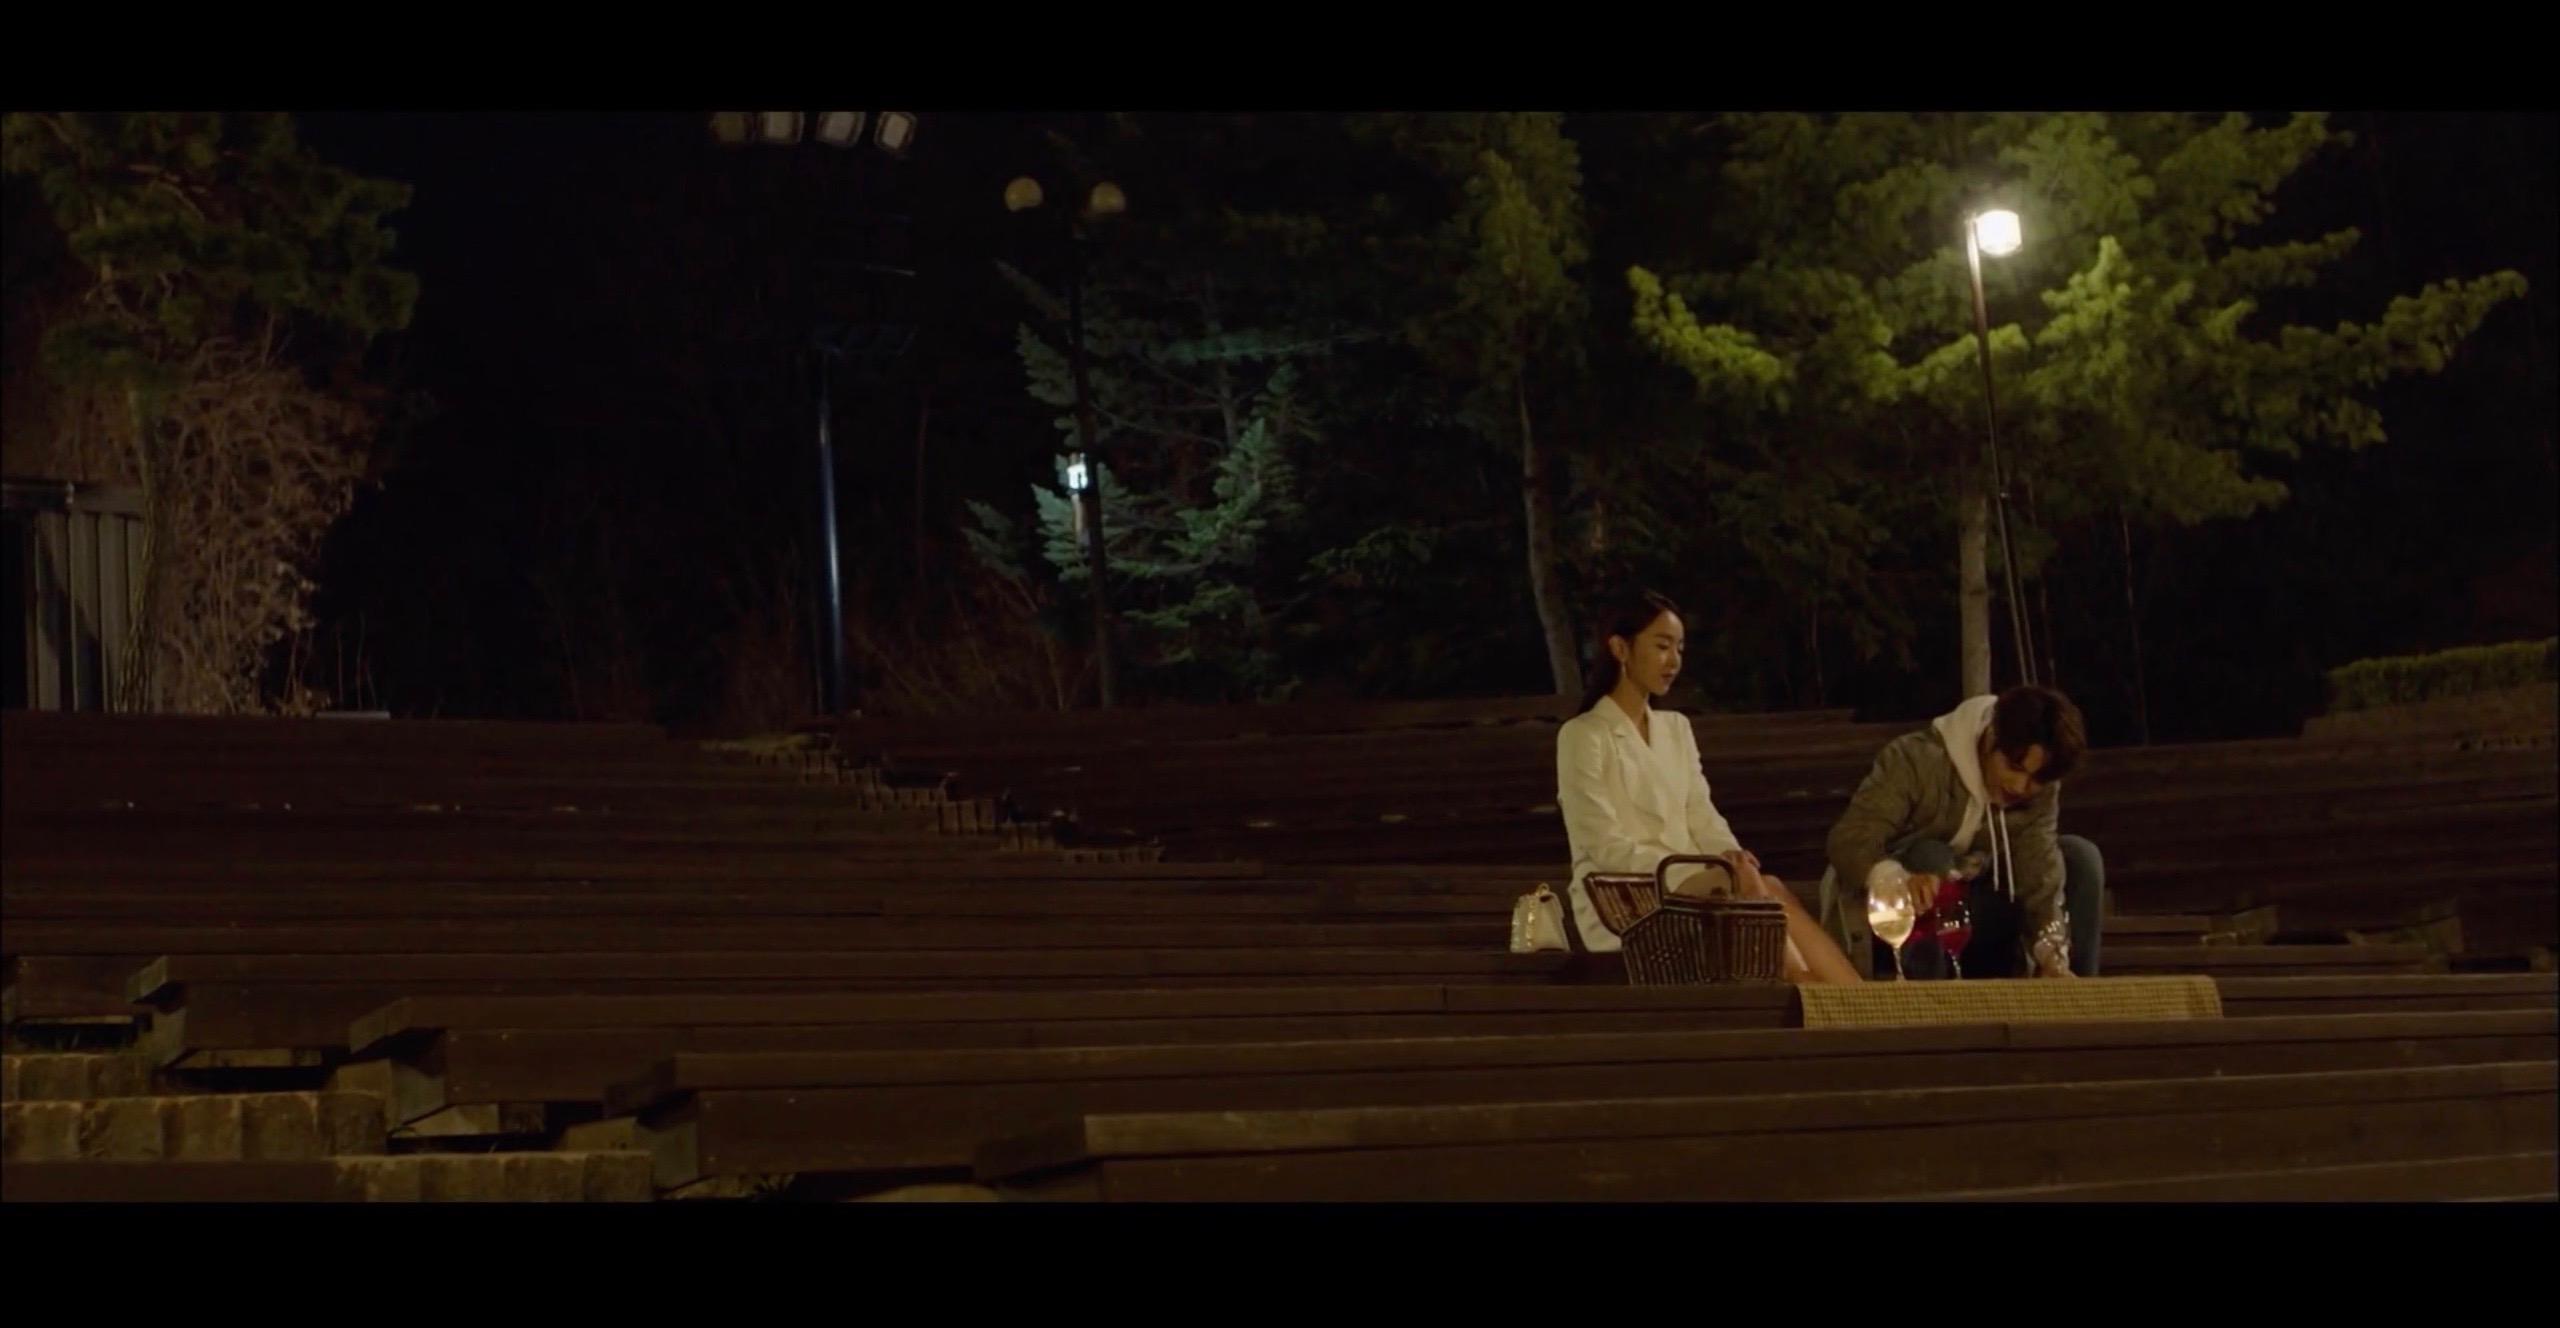 KT&G SangsangMadang Chuncheon [KT&G 상상마당 춘천 아트센터] – Korean